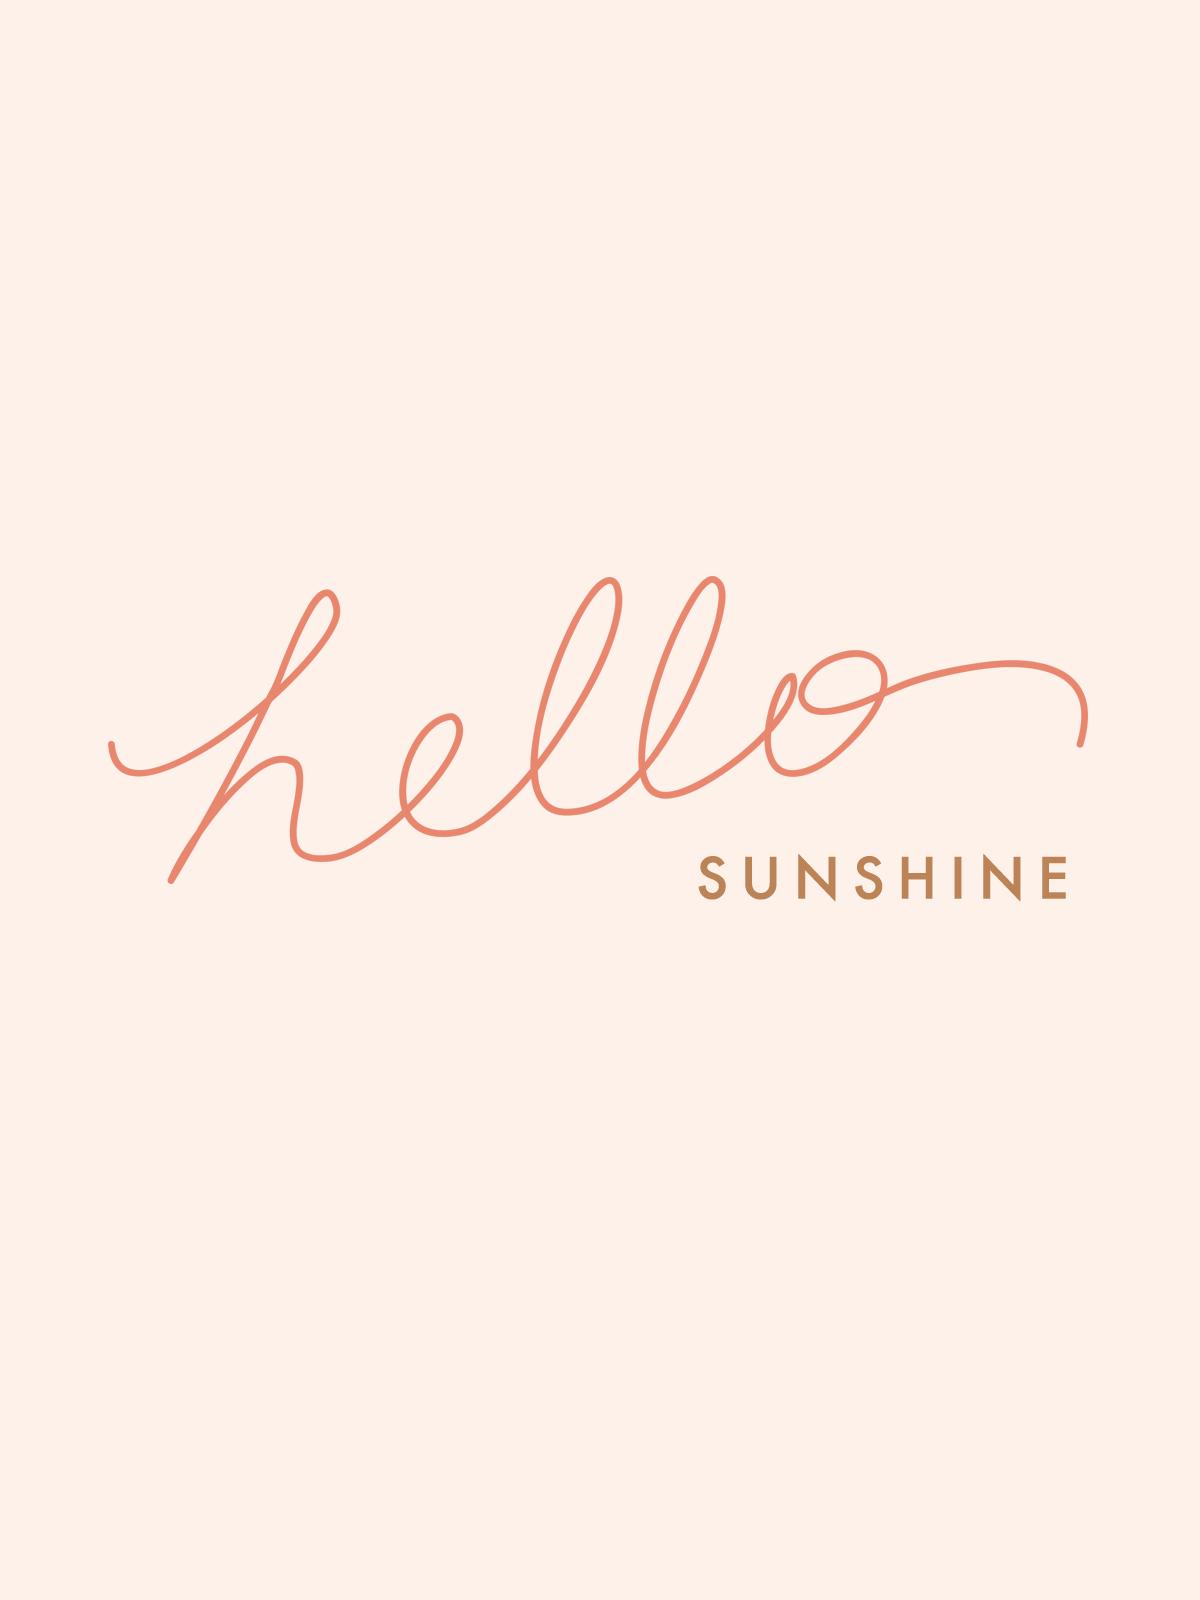 Gudetama Wallpaper Iphone Hello Sunshine Wallpaper Download